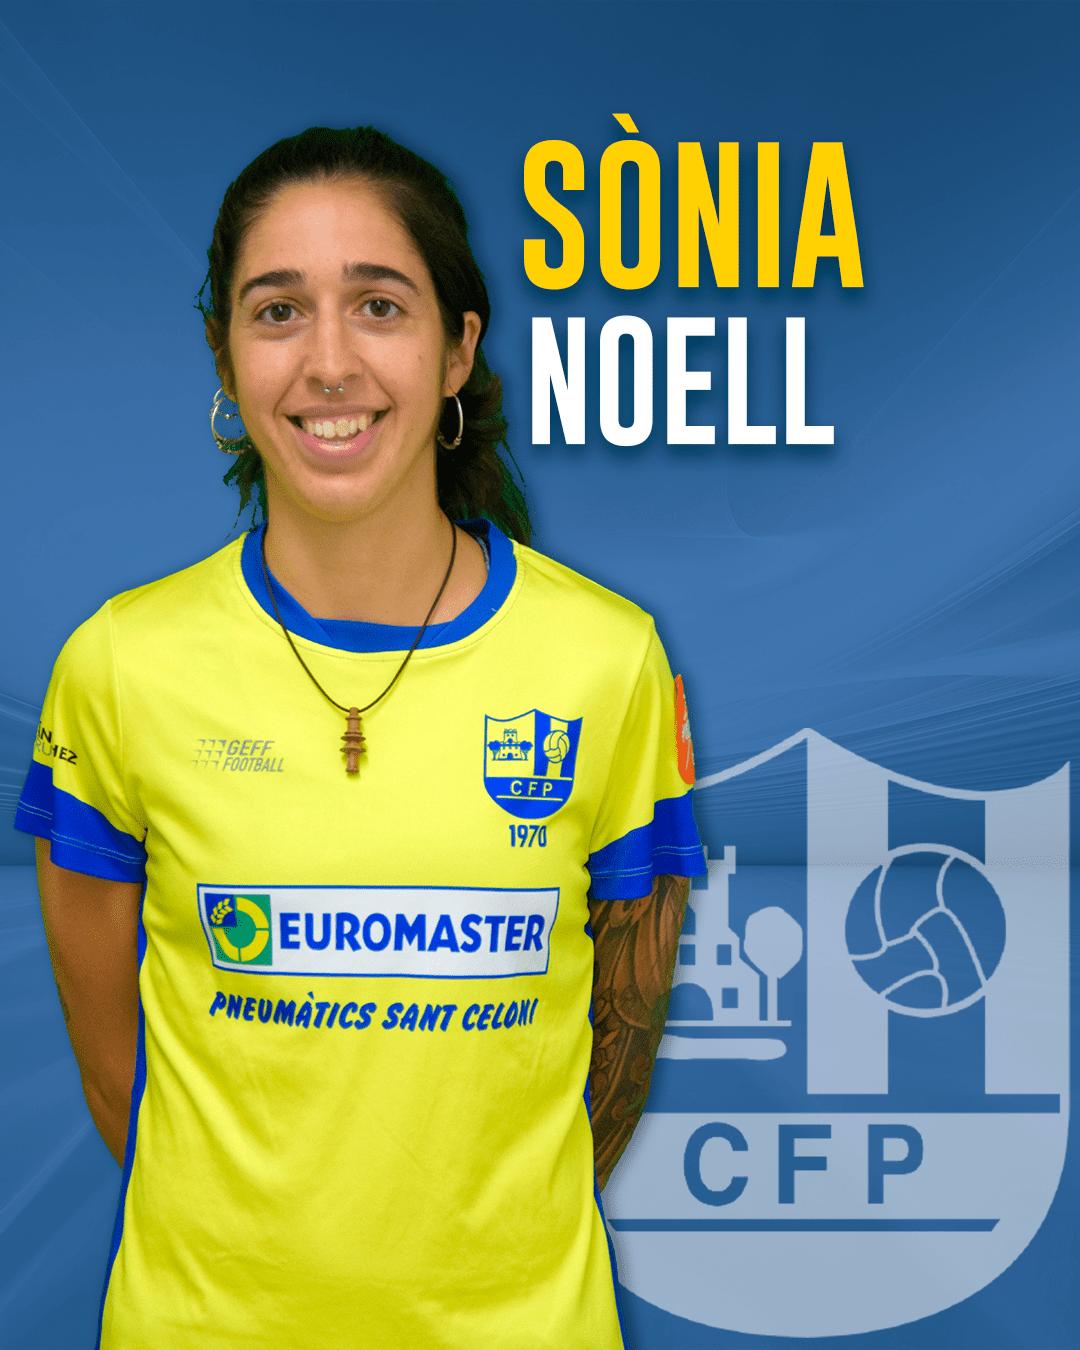 Sònia Noell